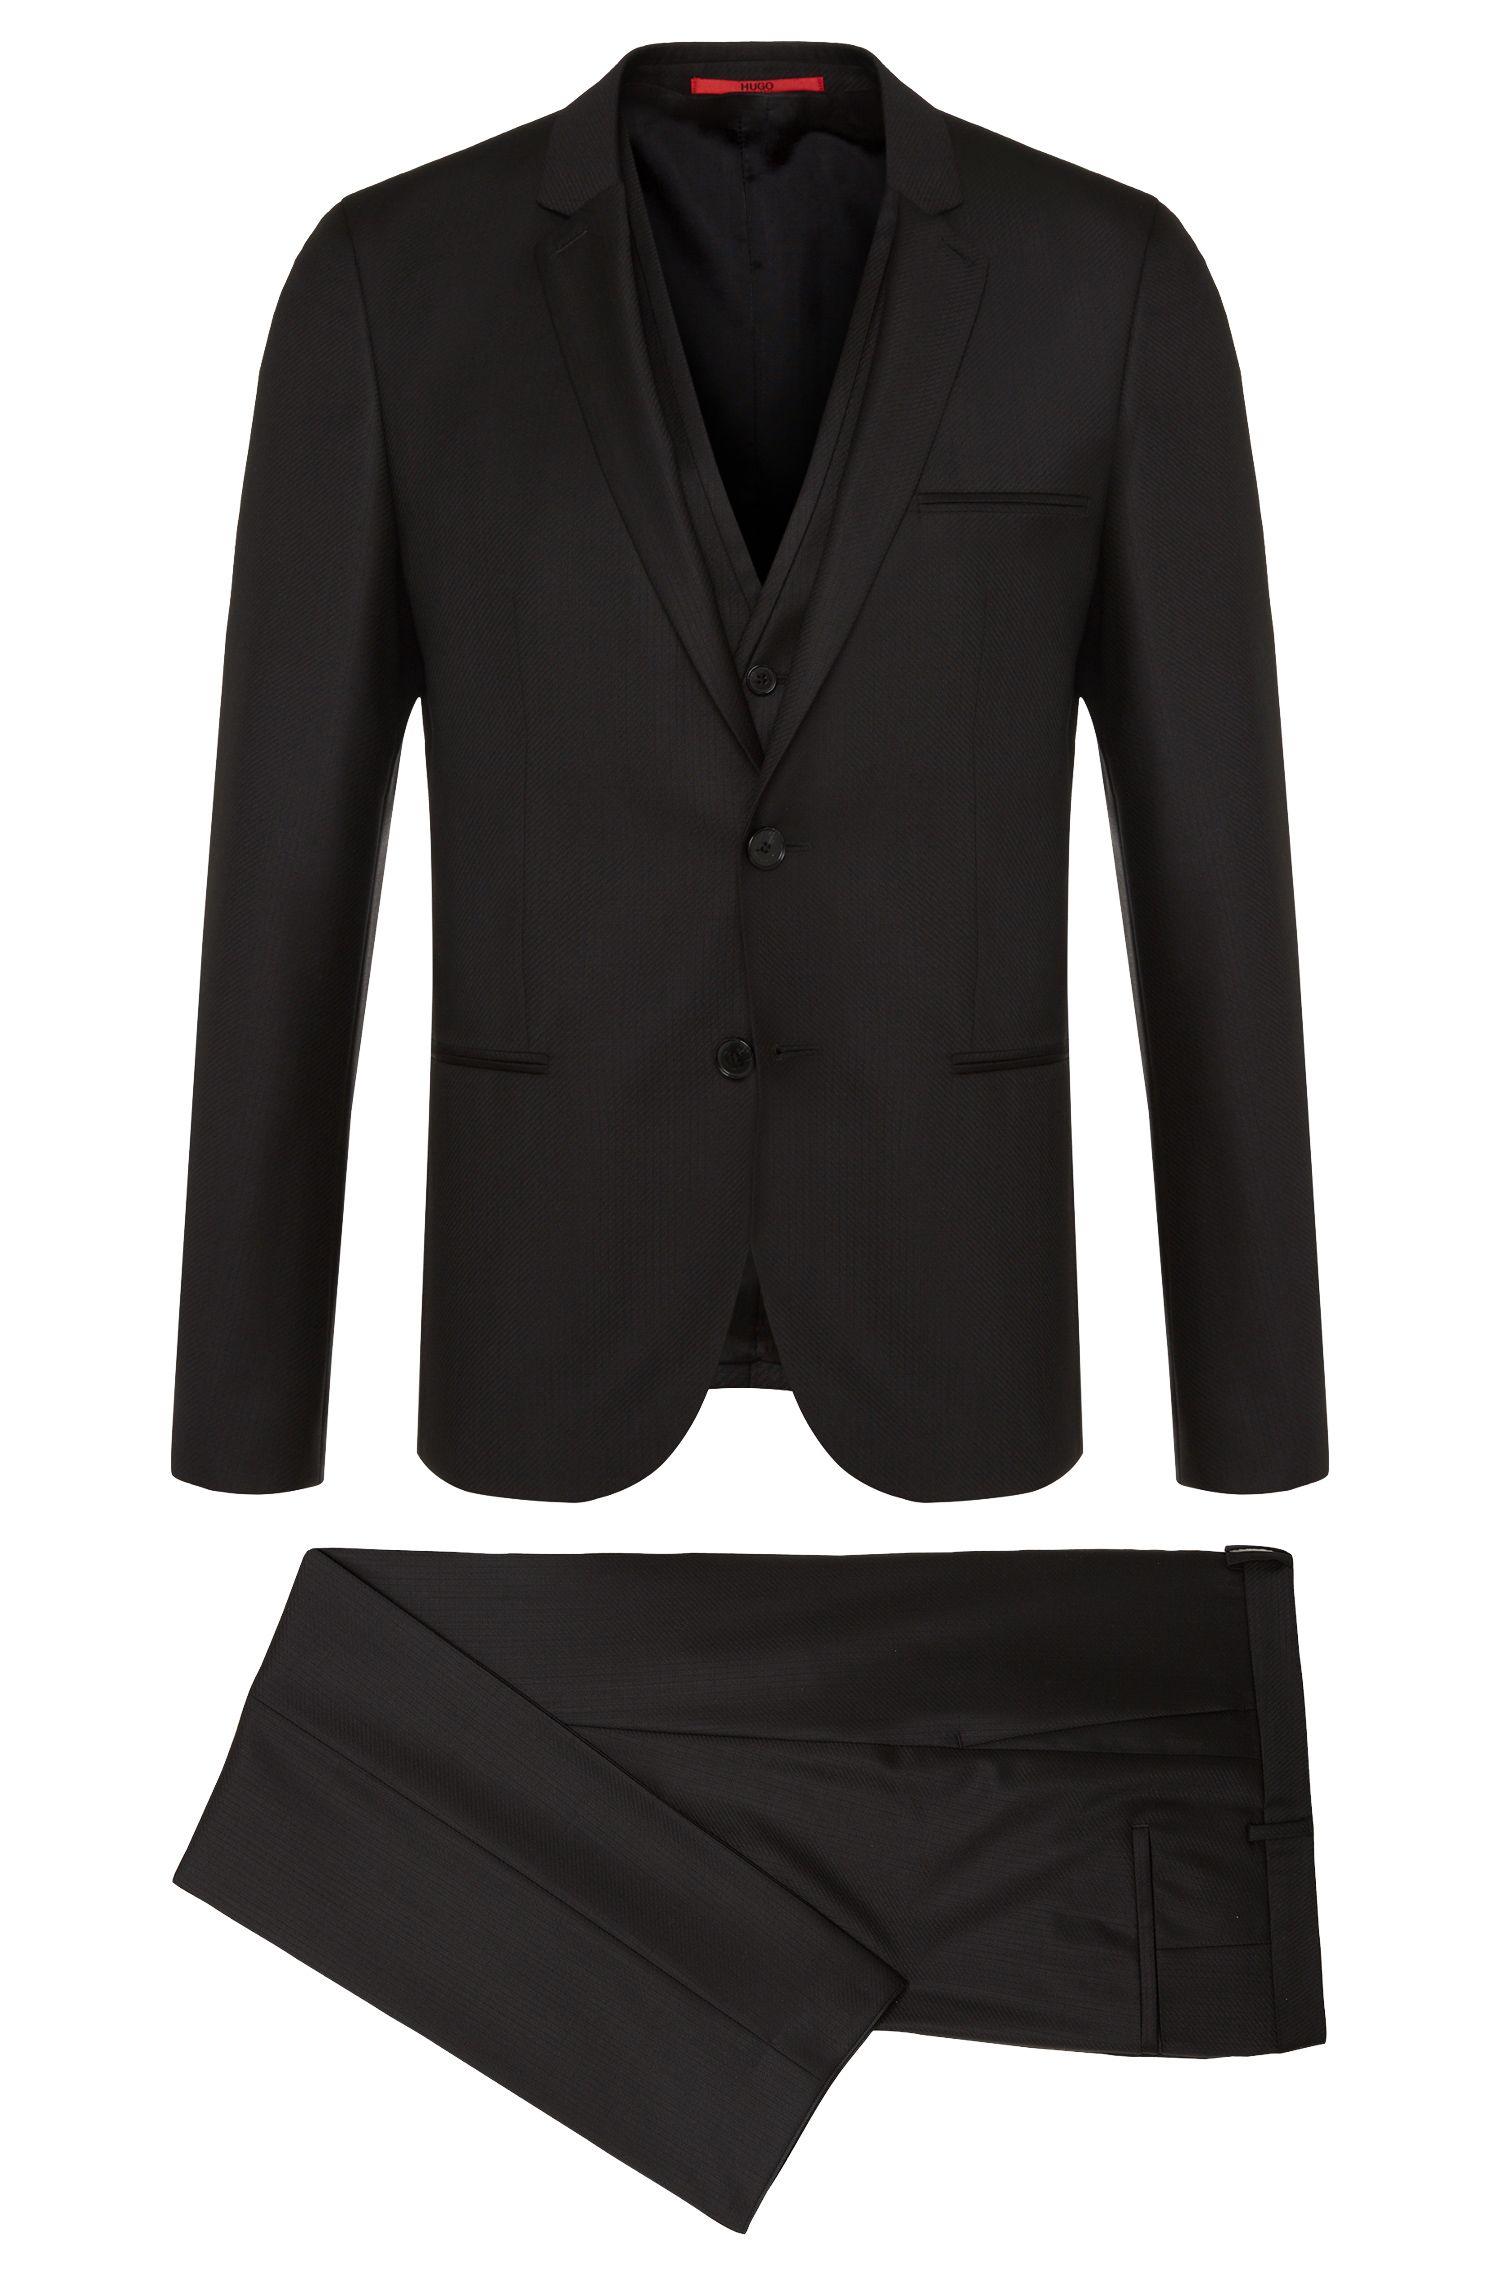 'Awald/Wins/Heibo3' | Slim Fit, Super 120 Wool 3-Piece Suit